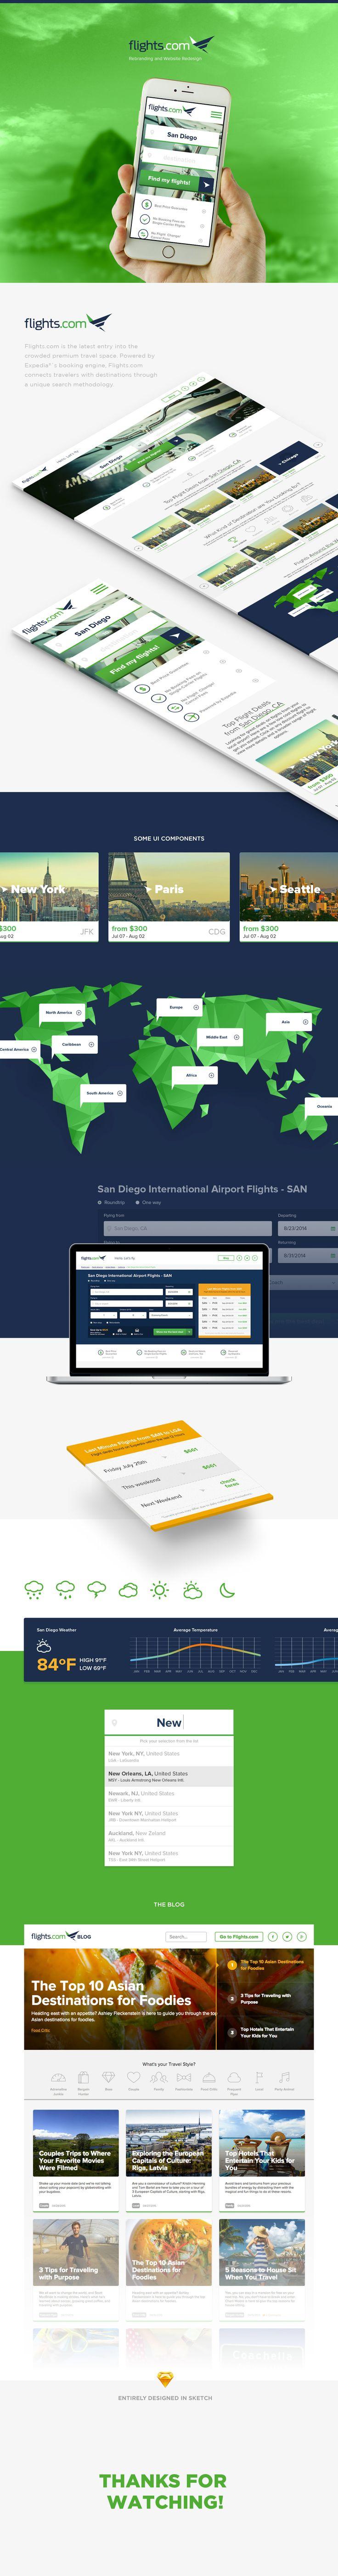 Flights.com on Behance